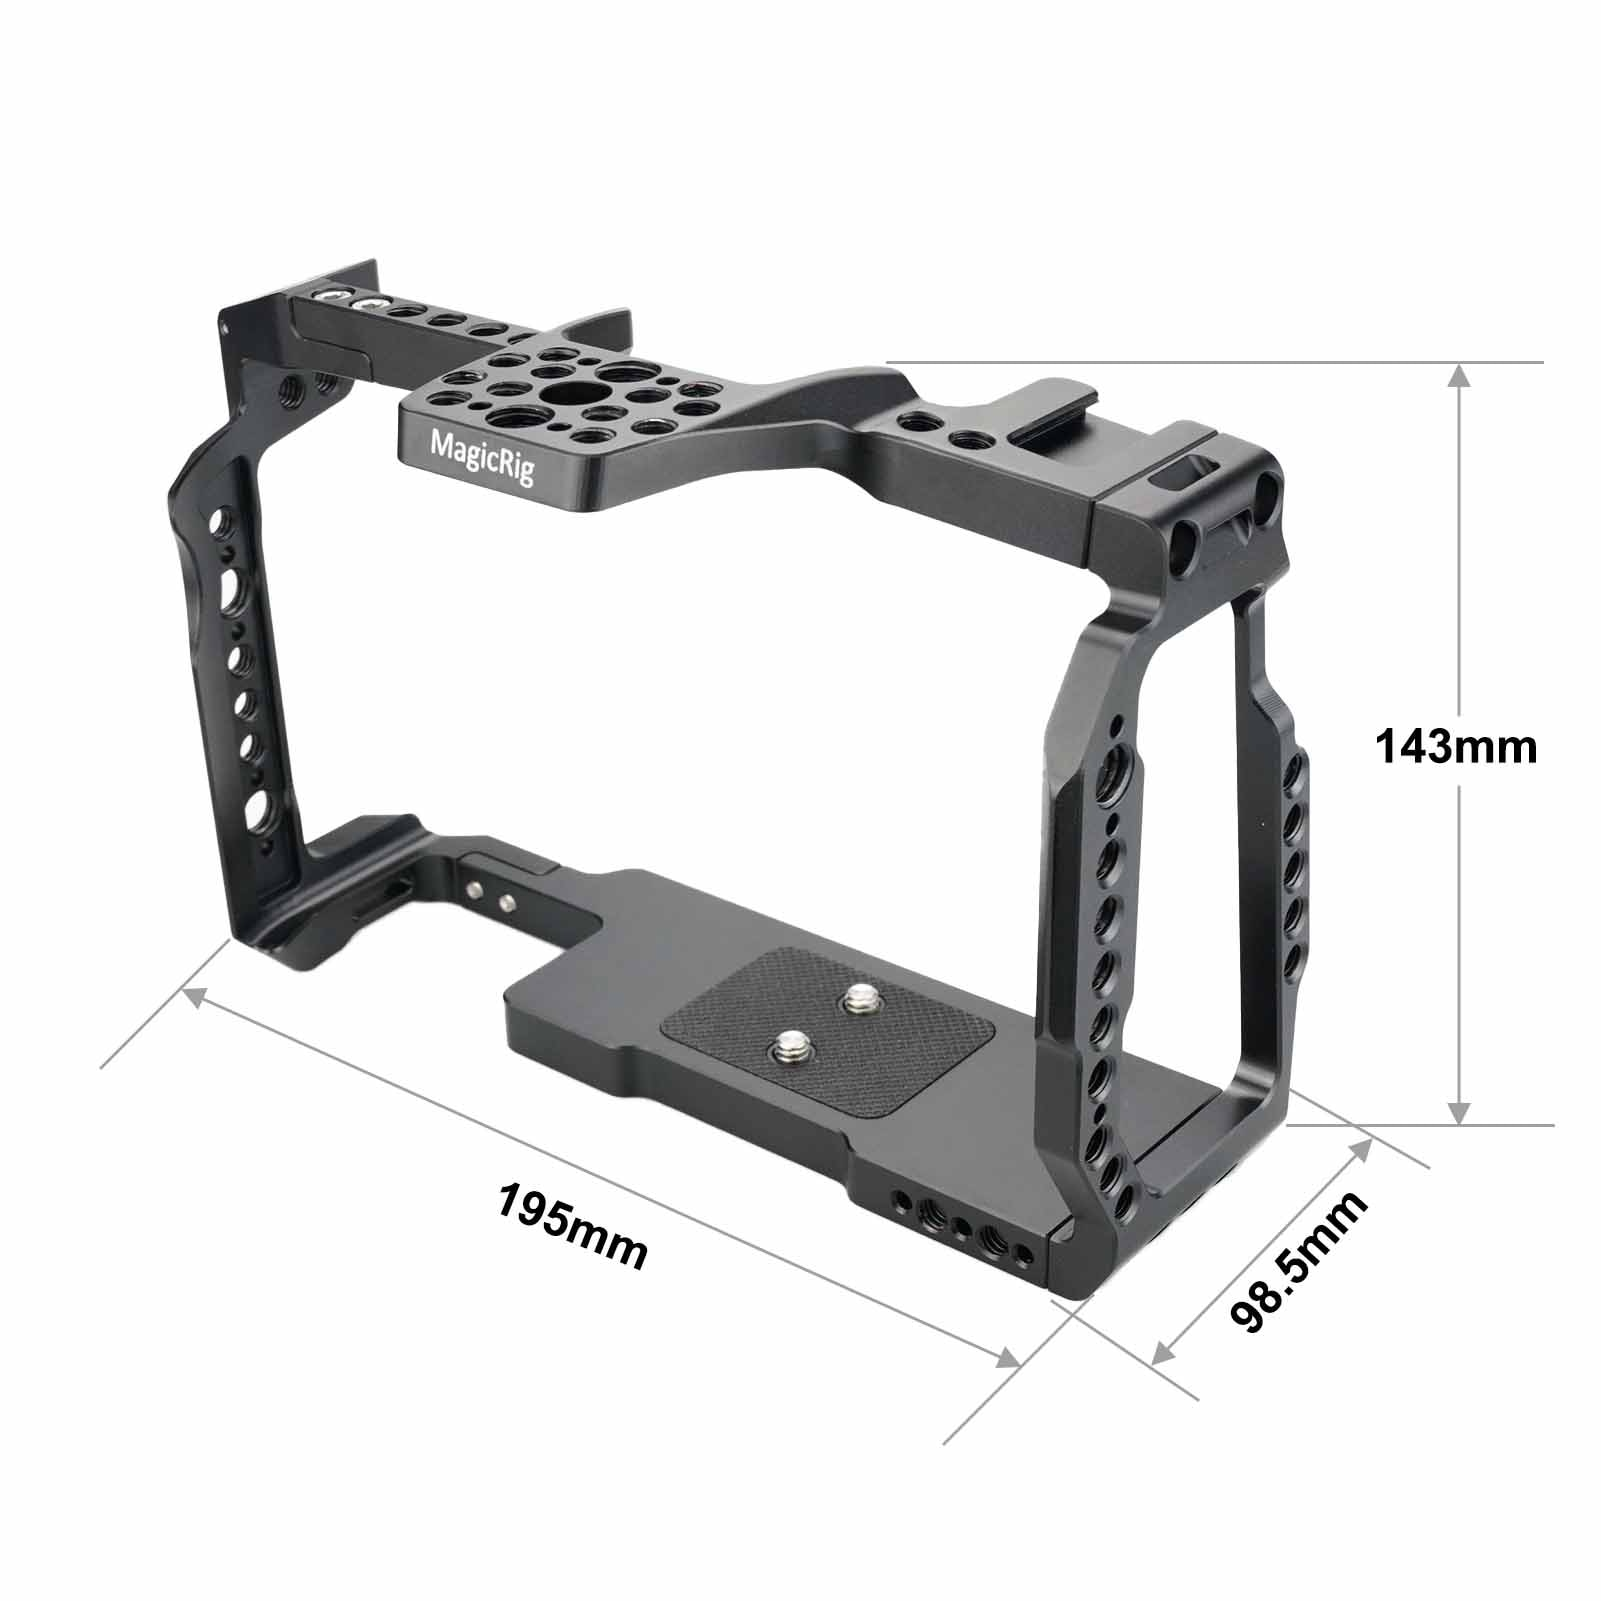 MAGICRIG Full Cage With ARRI Locating Hole & Cold Shoe for Blackmagic Design Pocket Cinema Camera 6K Pro(Bmpcc 6k Pro) enlarge